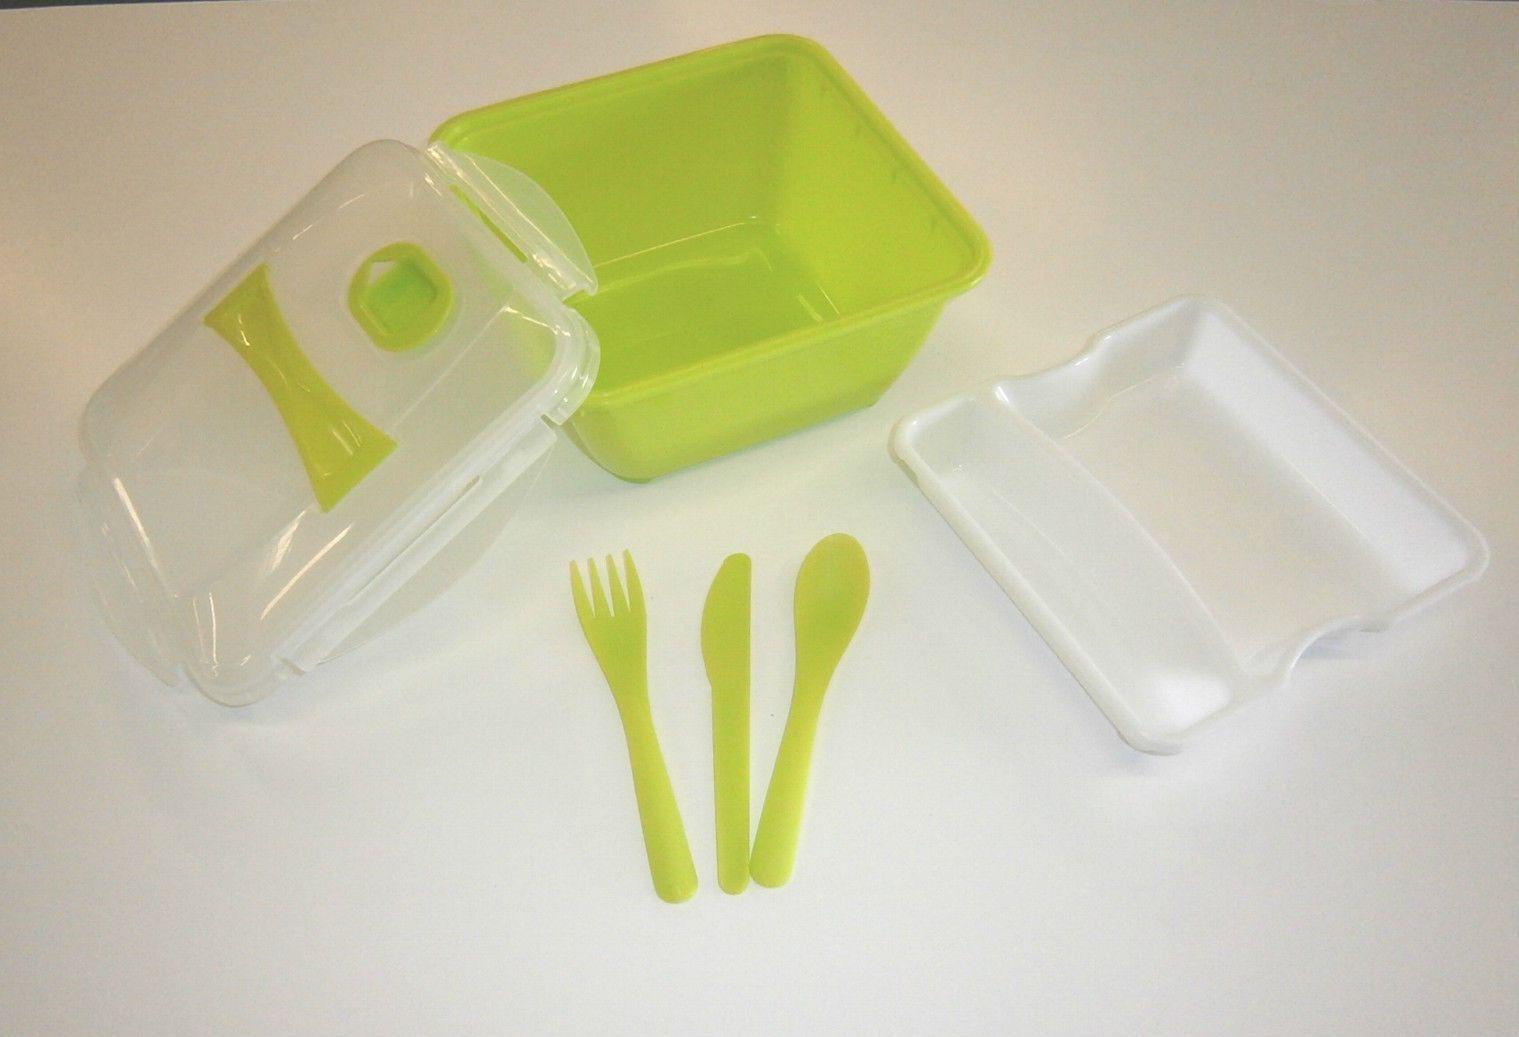 Lunch Box Boite Plastique Boite Pique Nique Panier Repas Boite